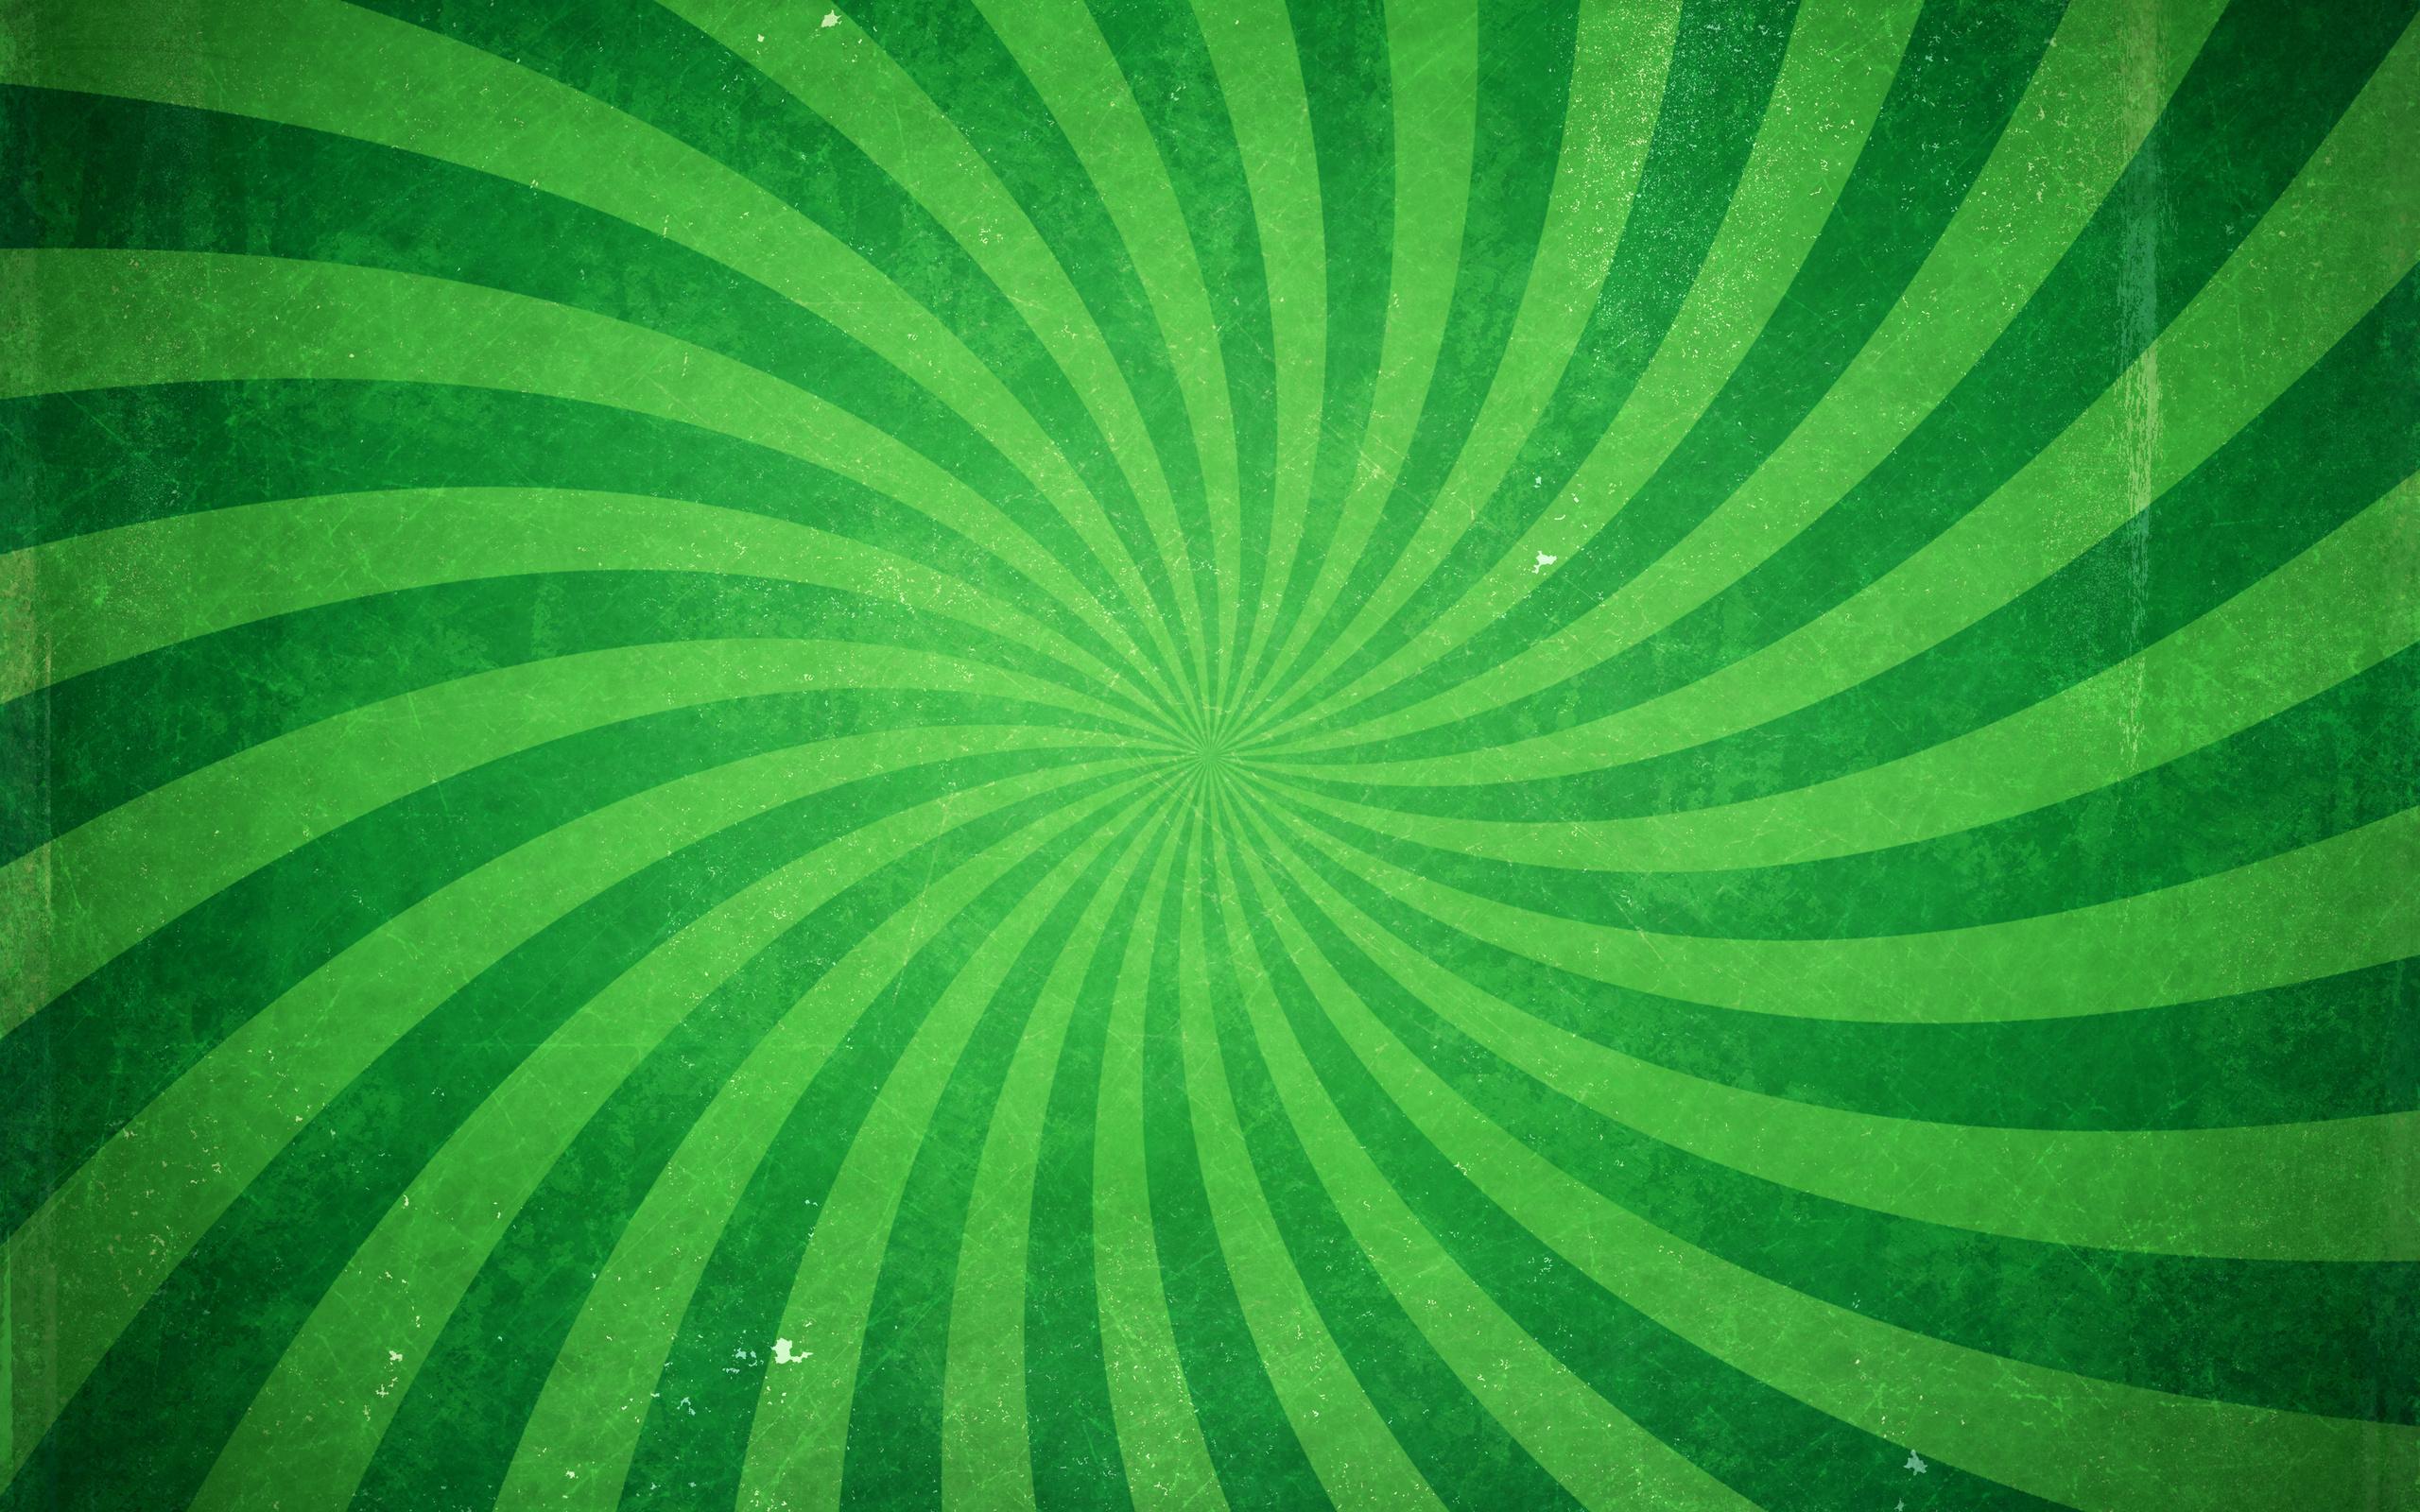 Hd wallpaper green - Hd Wallpaper Background Id 381610 2560x1600 Abstract Green